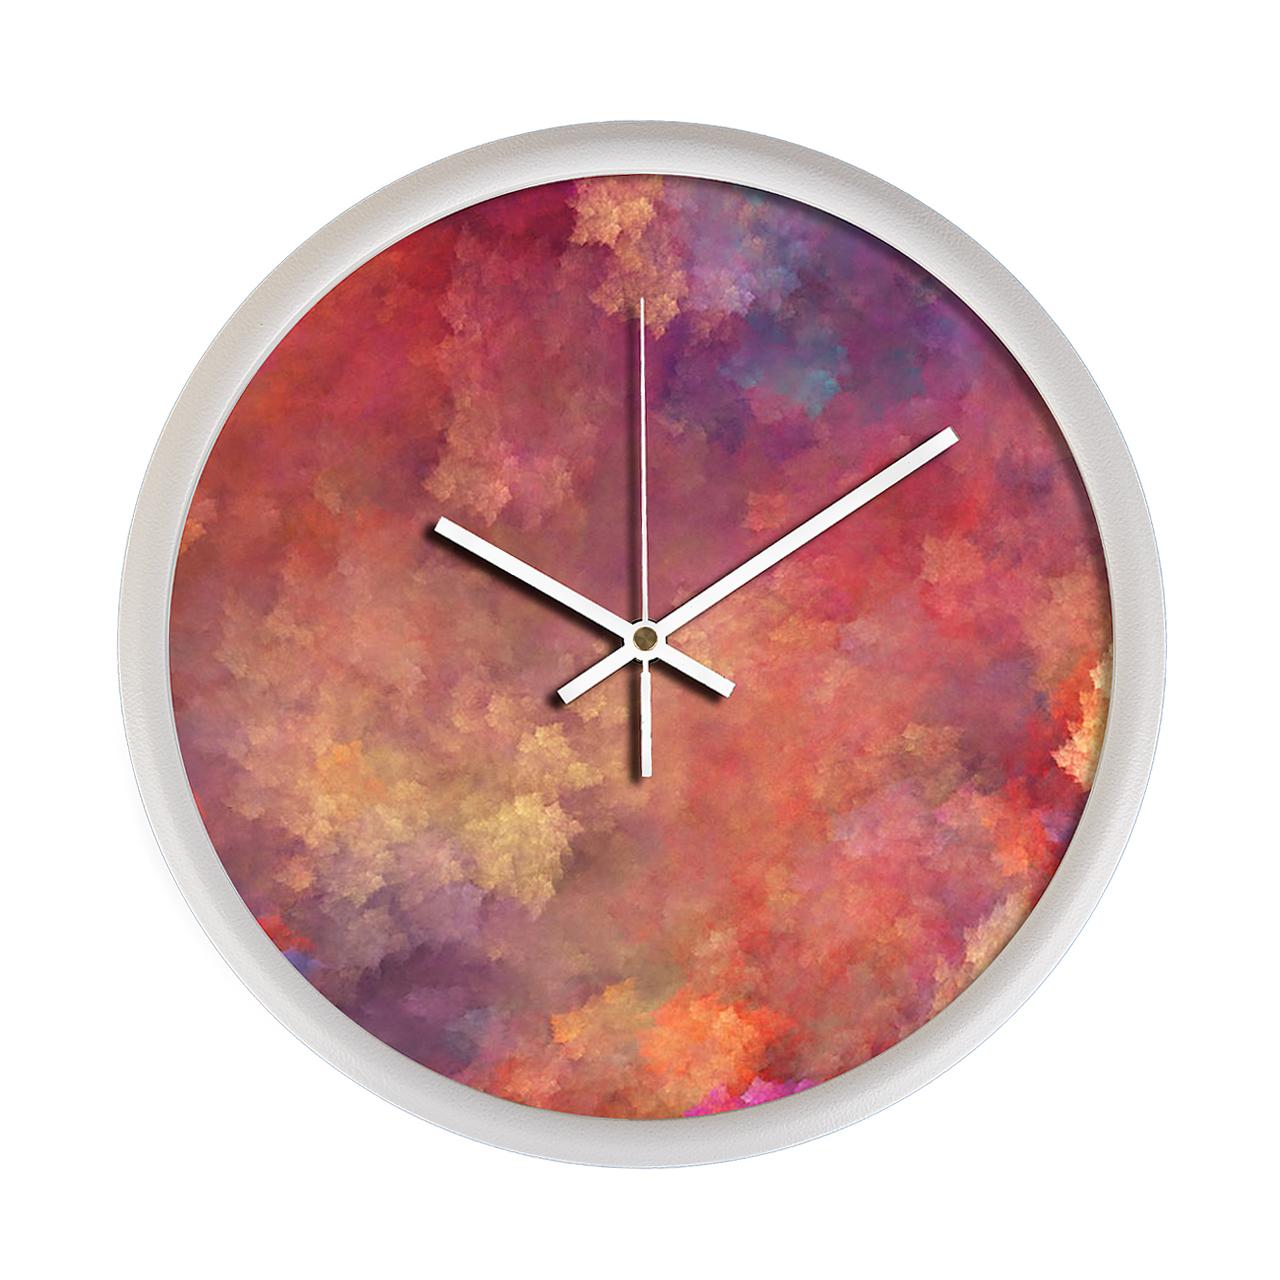 ساعت دیواری مینی مال لاکچری مدل 35Dio3_0654